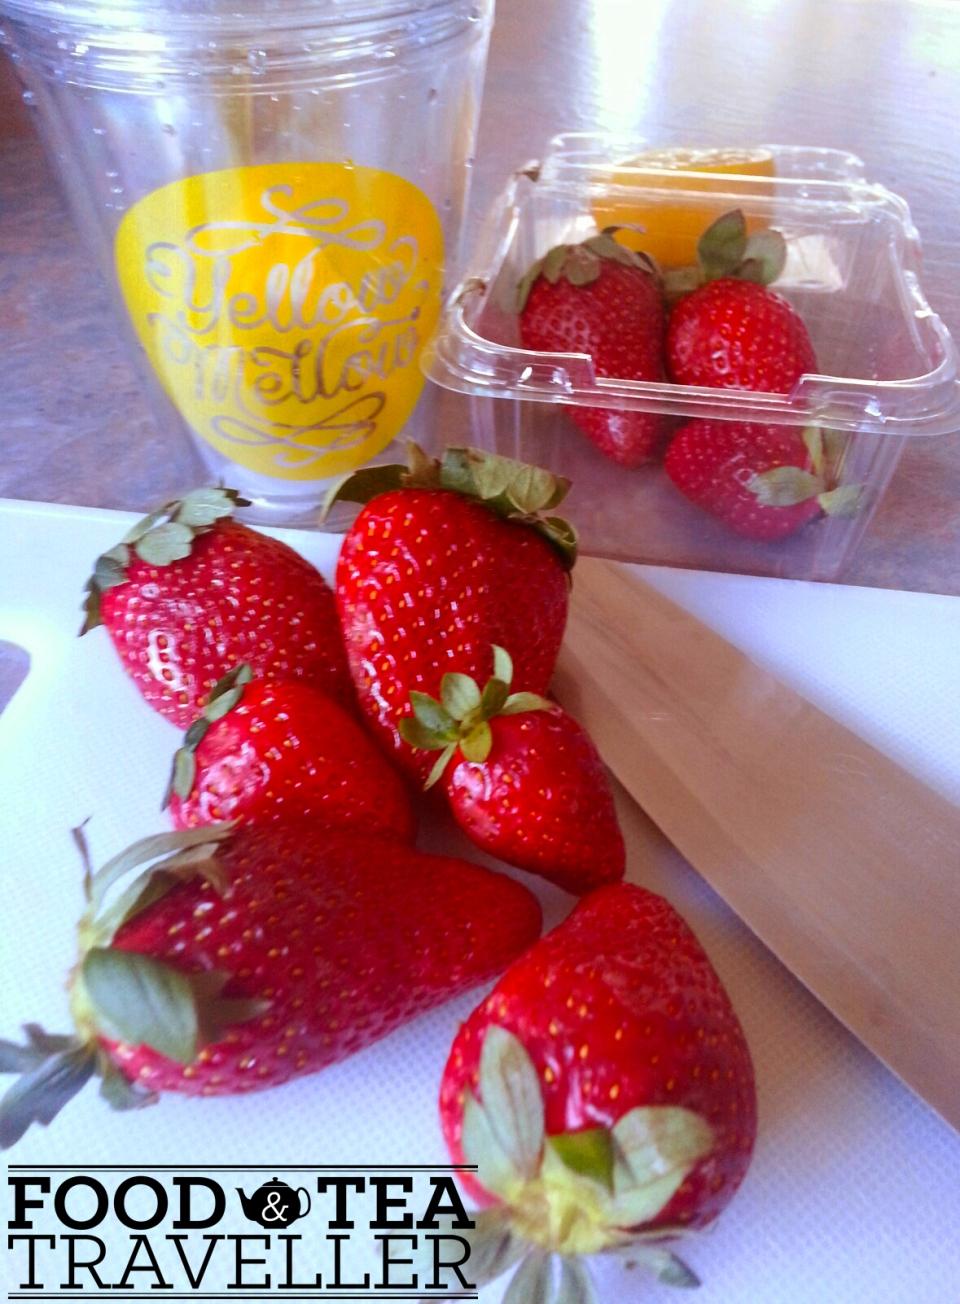 Minty-Strawberry-and-Lemon-ice-tea